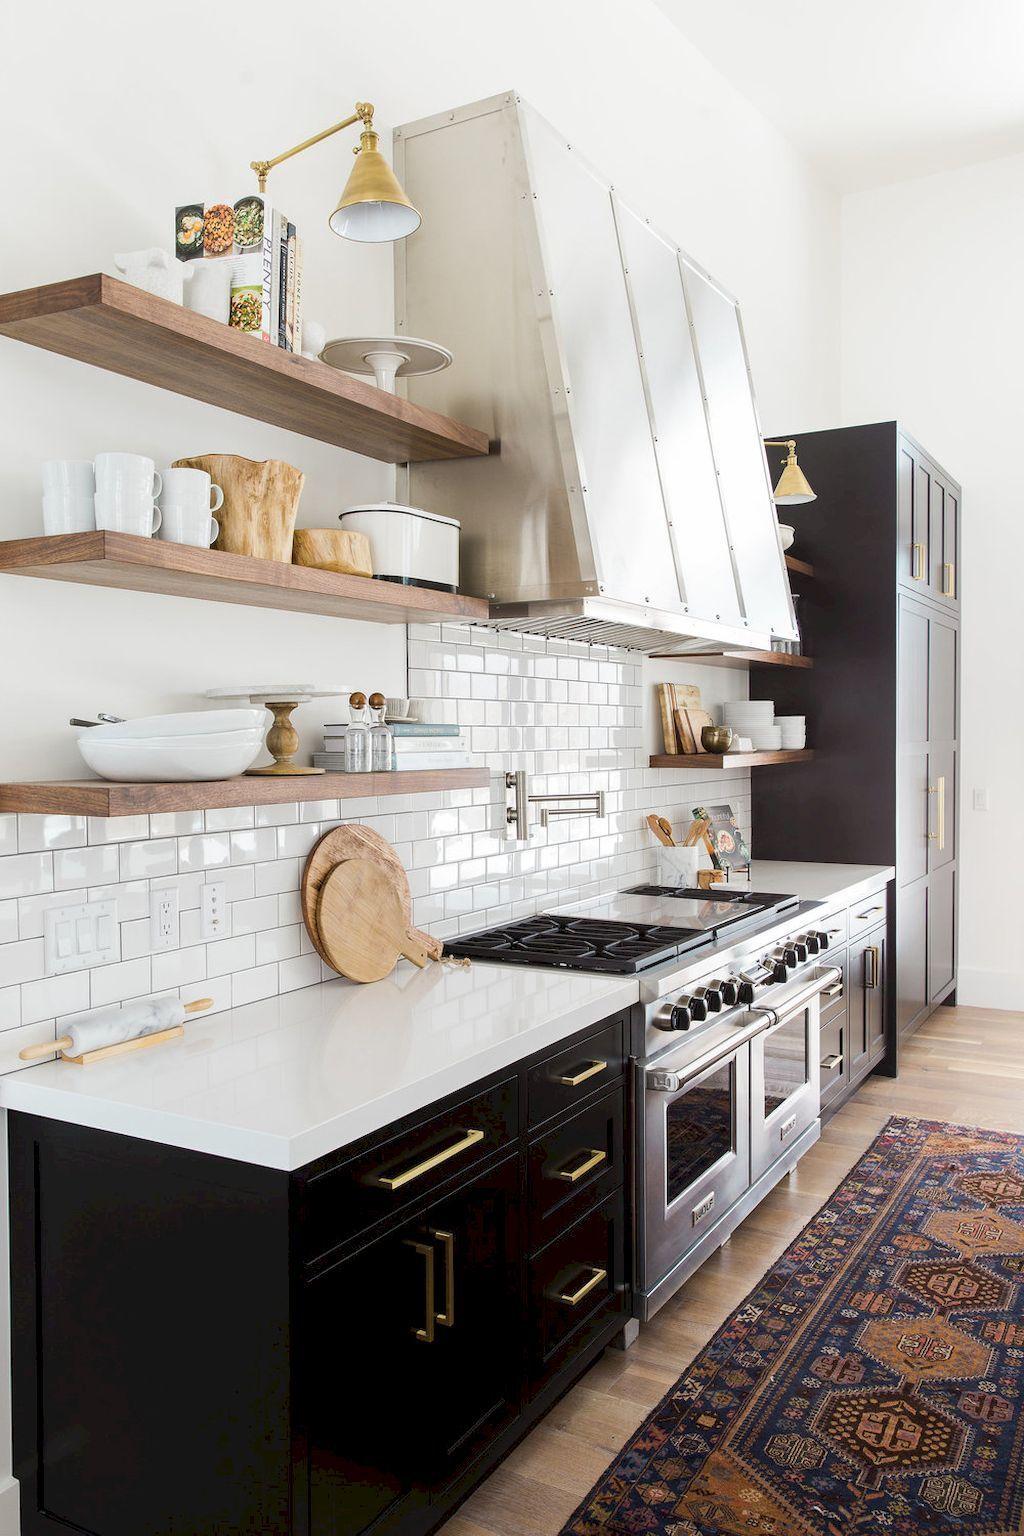 90 Rustic Kitchen Cabinets Farmhouse Style Ideas   Rustic kitchen ...